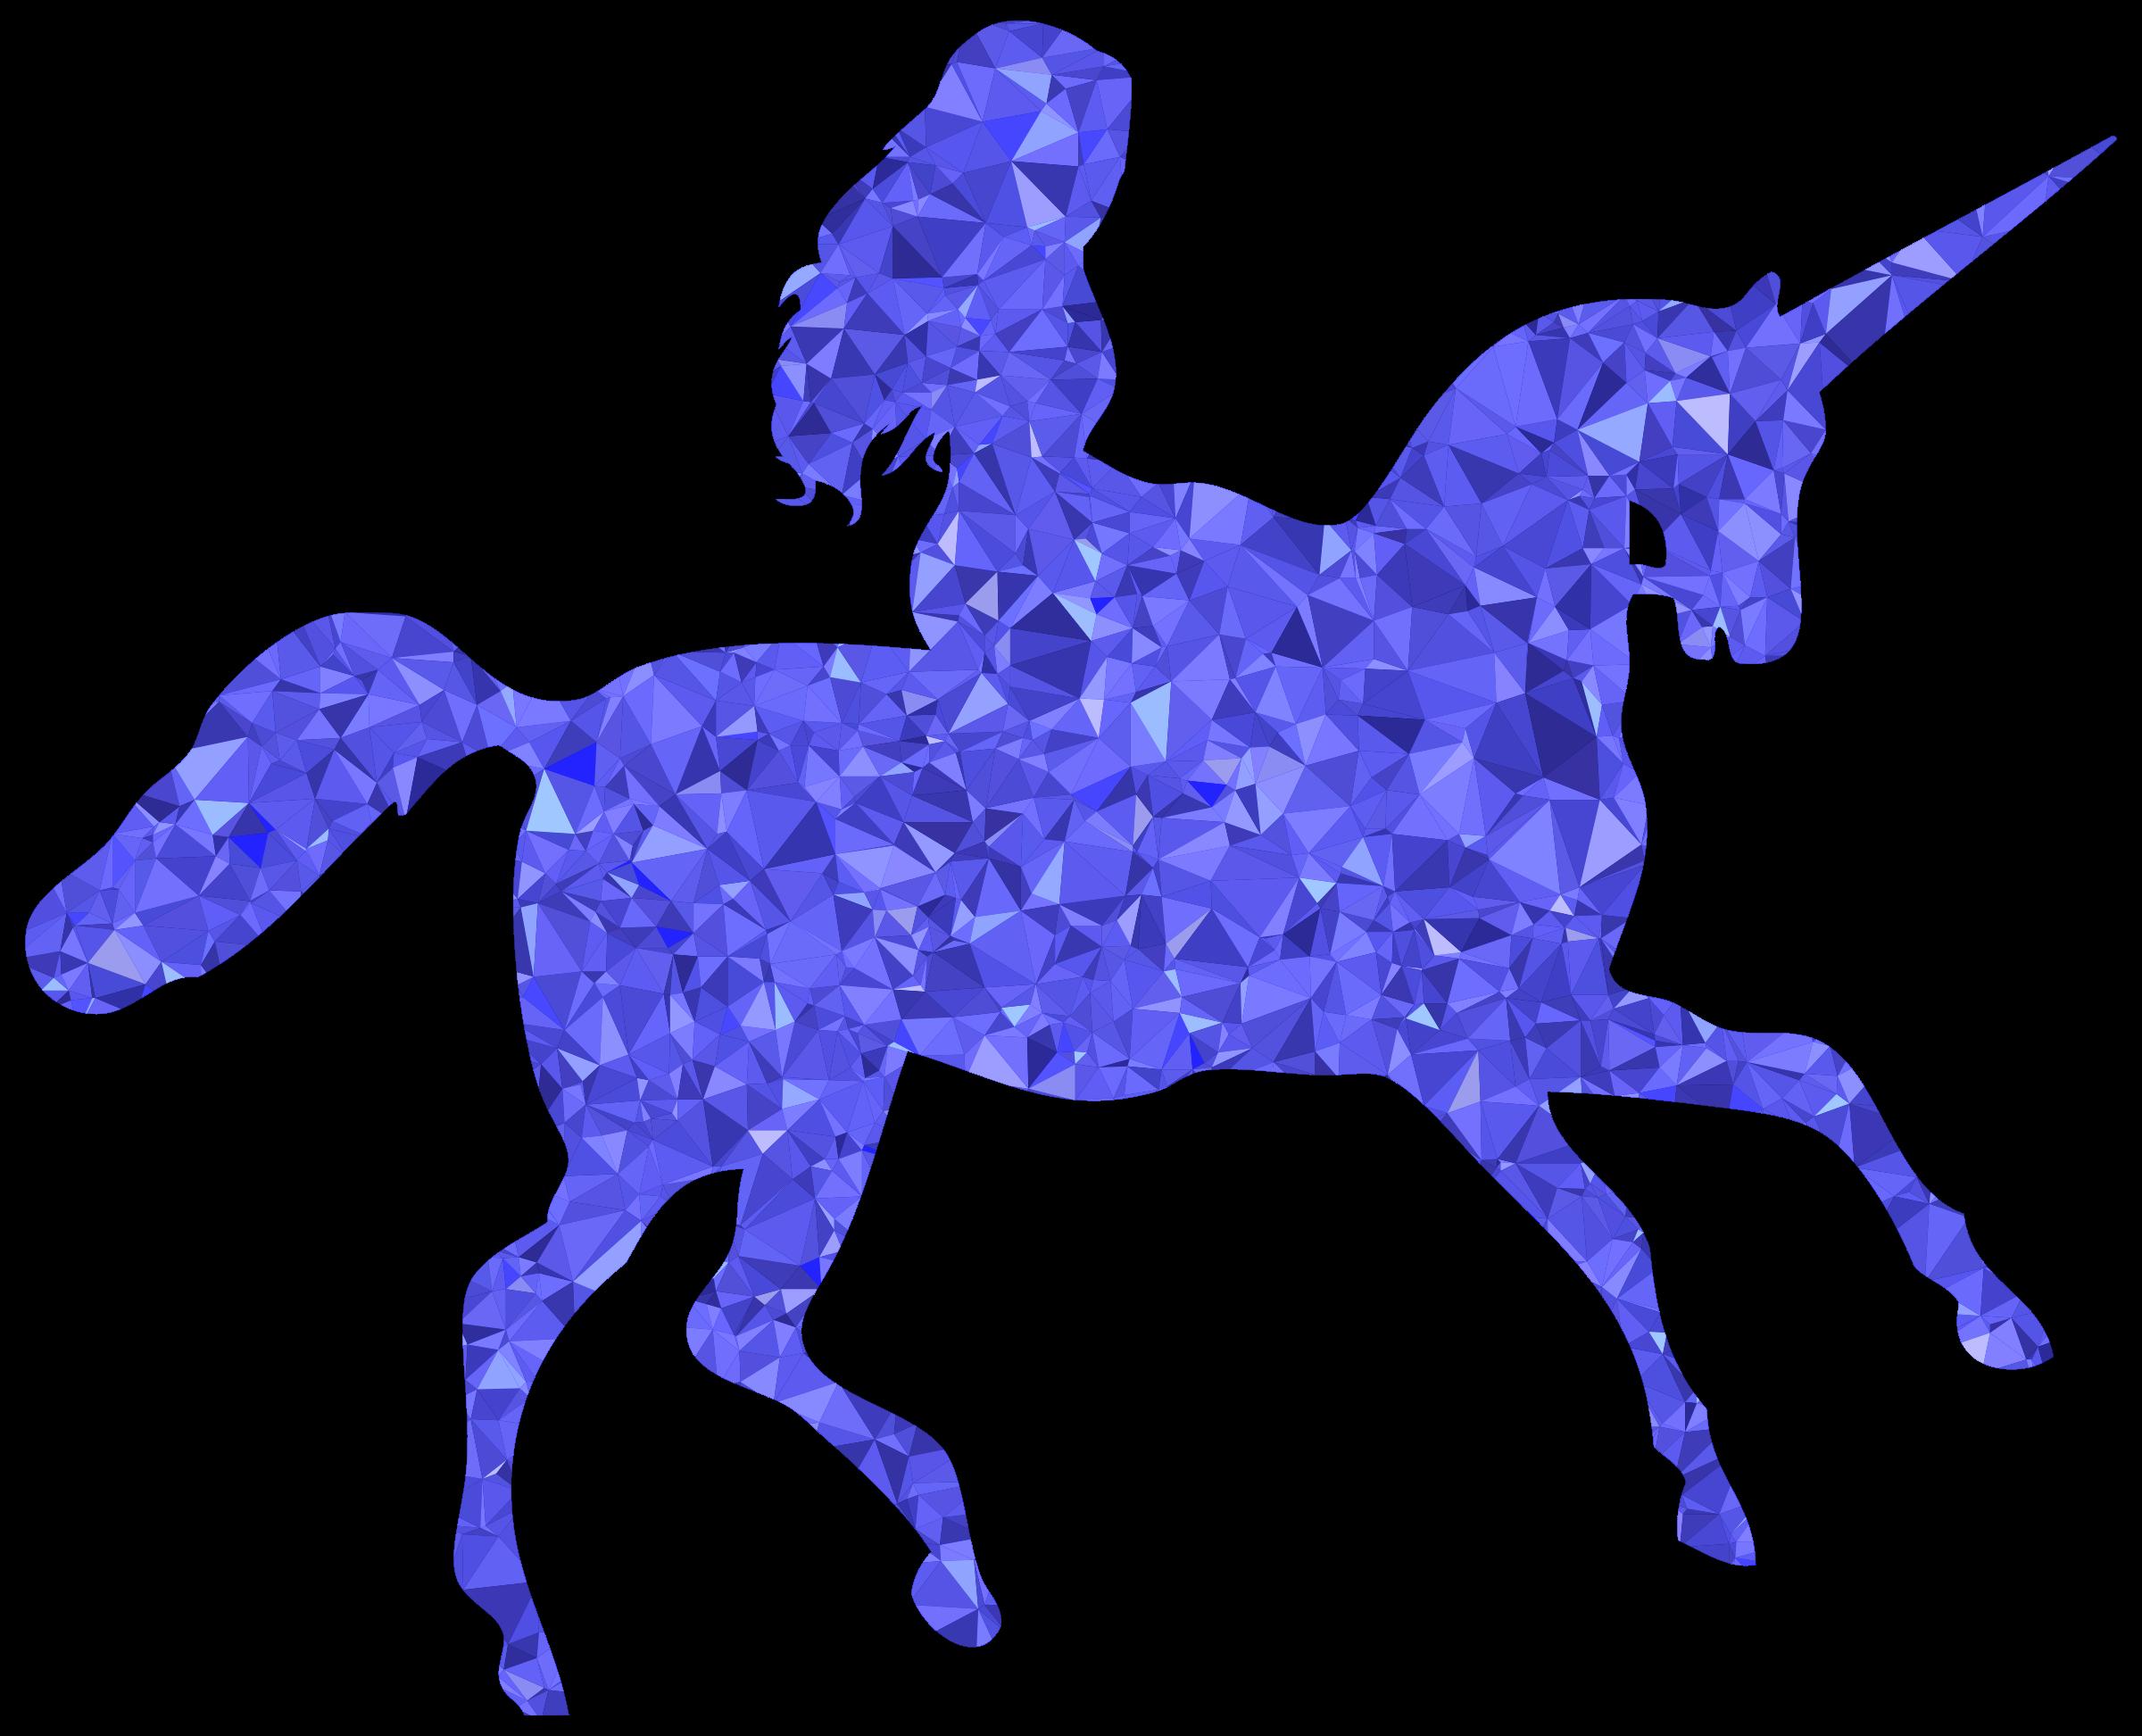 Clipart unicorn blue. Sapphire woman riding big